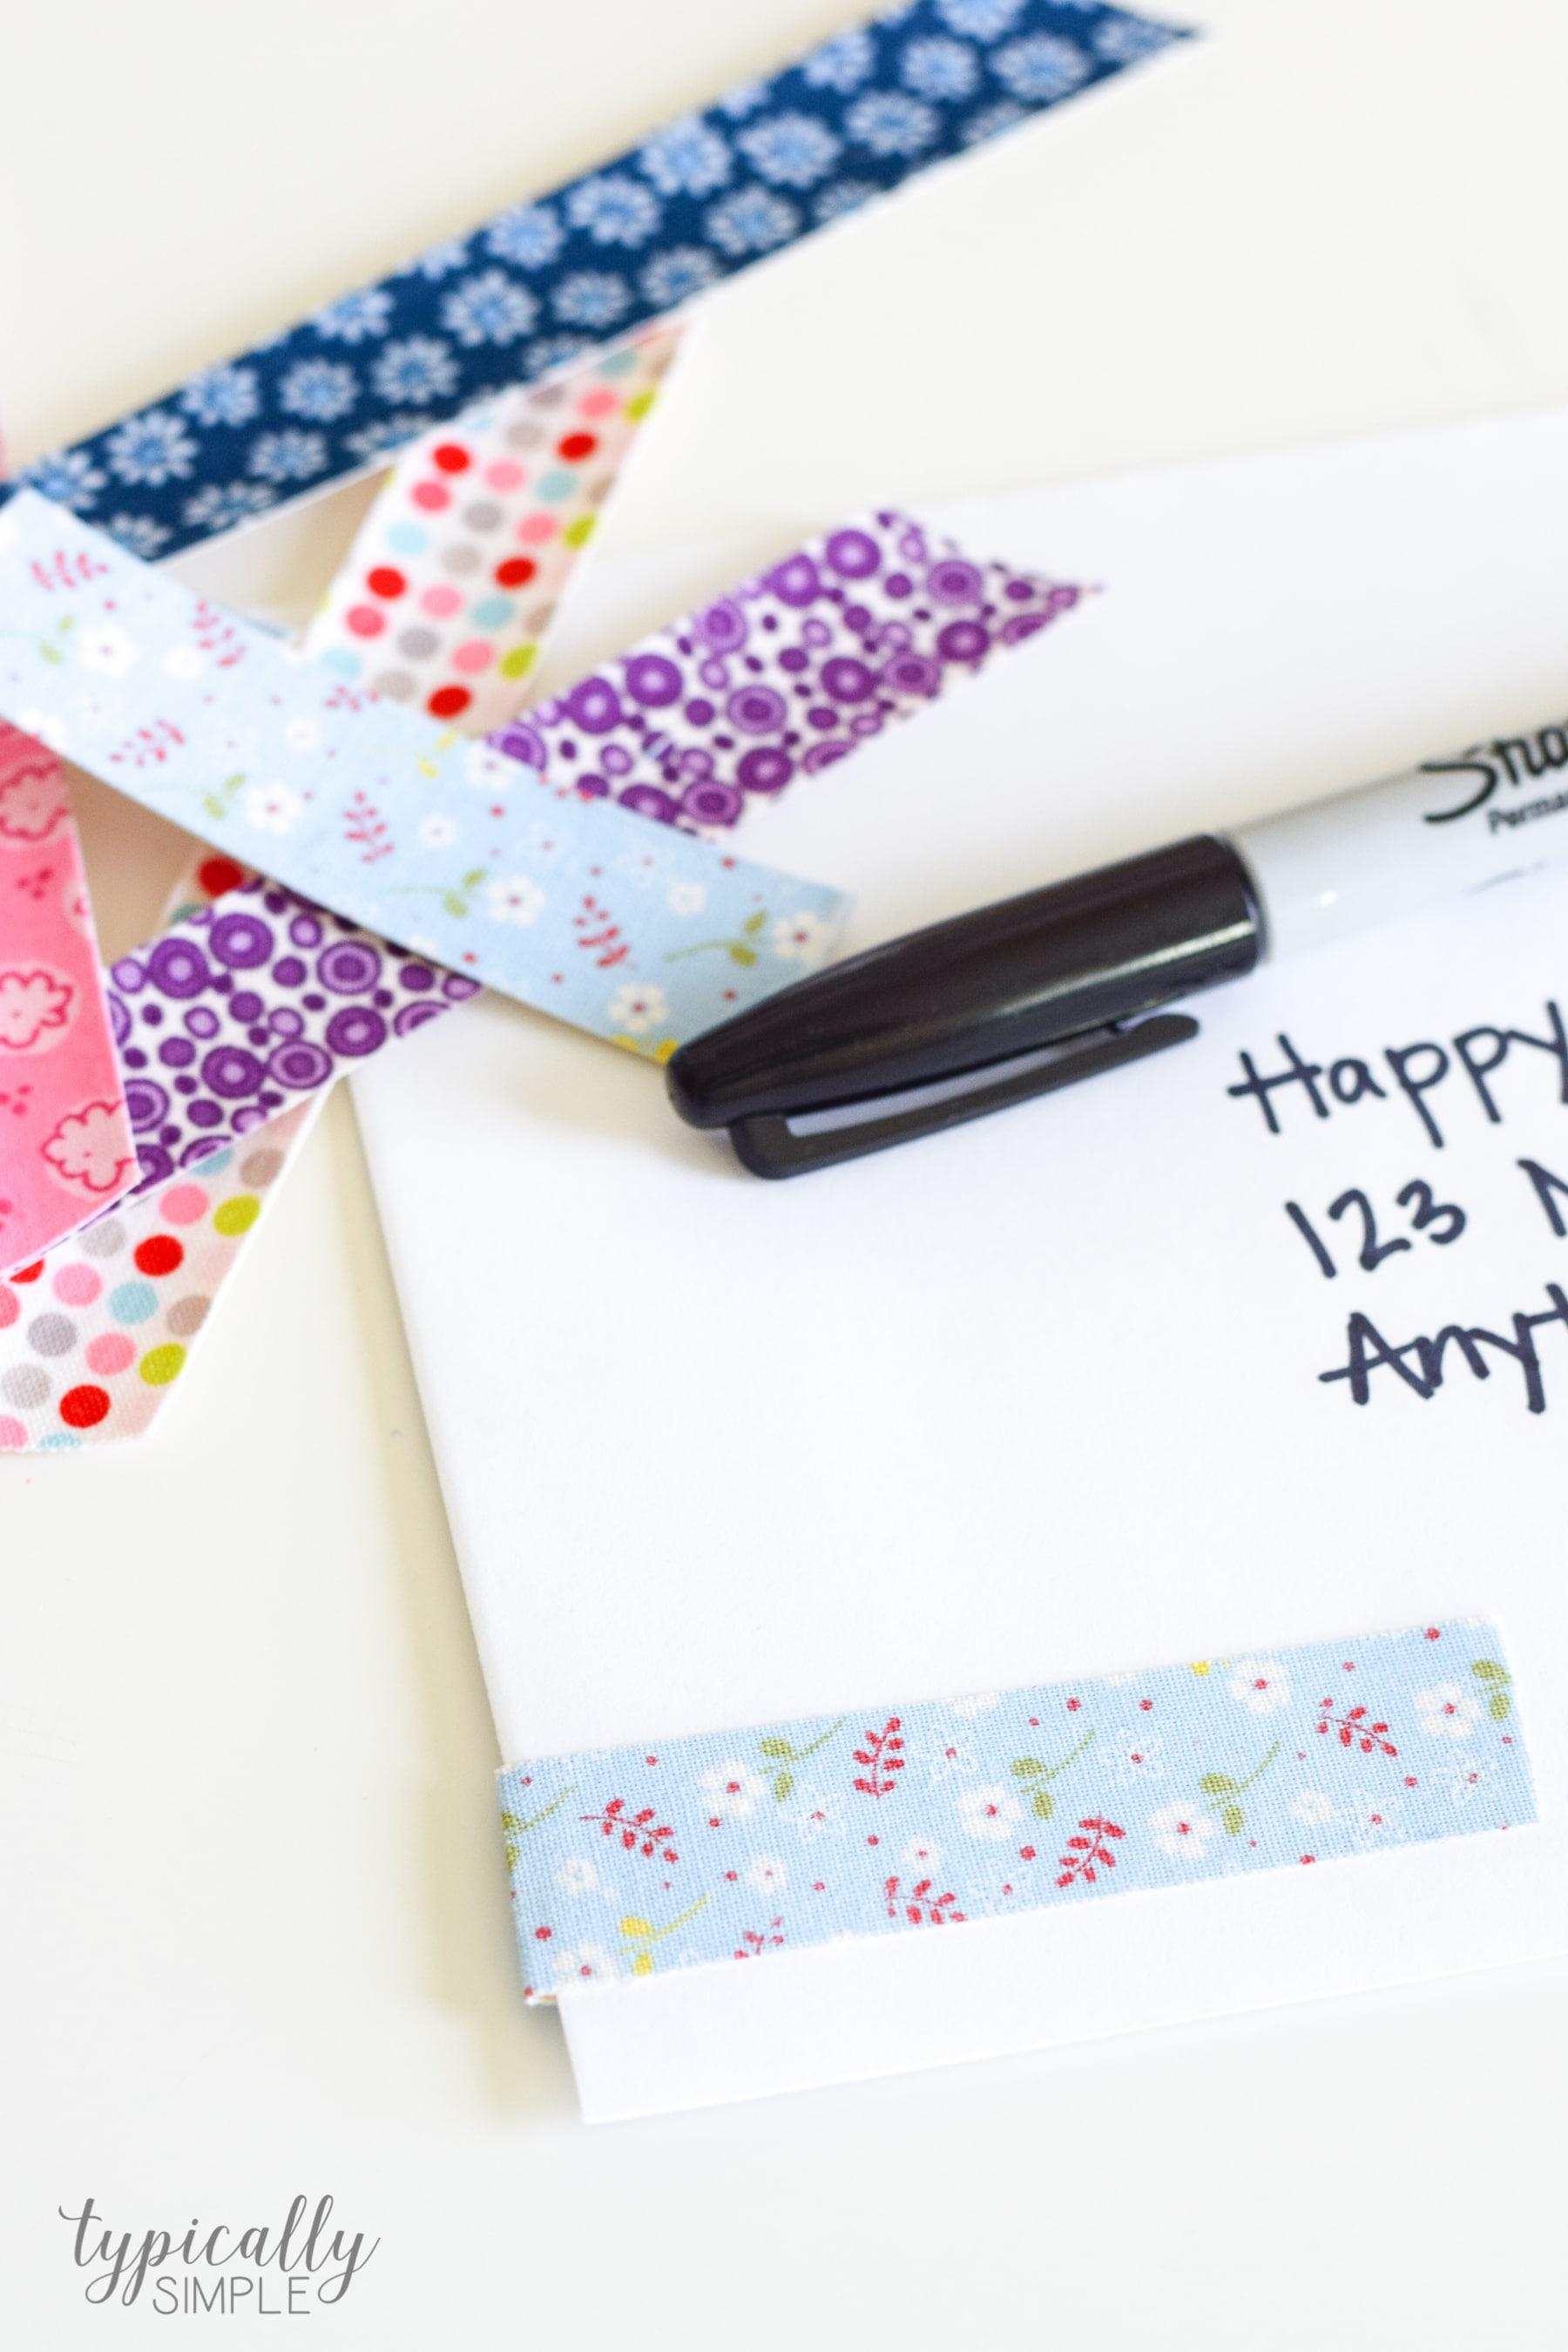 DIY Fabric Tape via Typically Simple